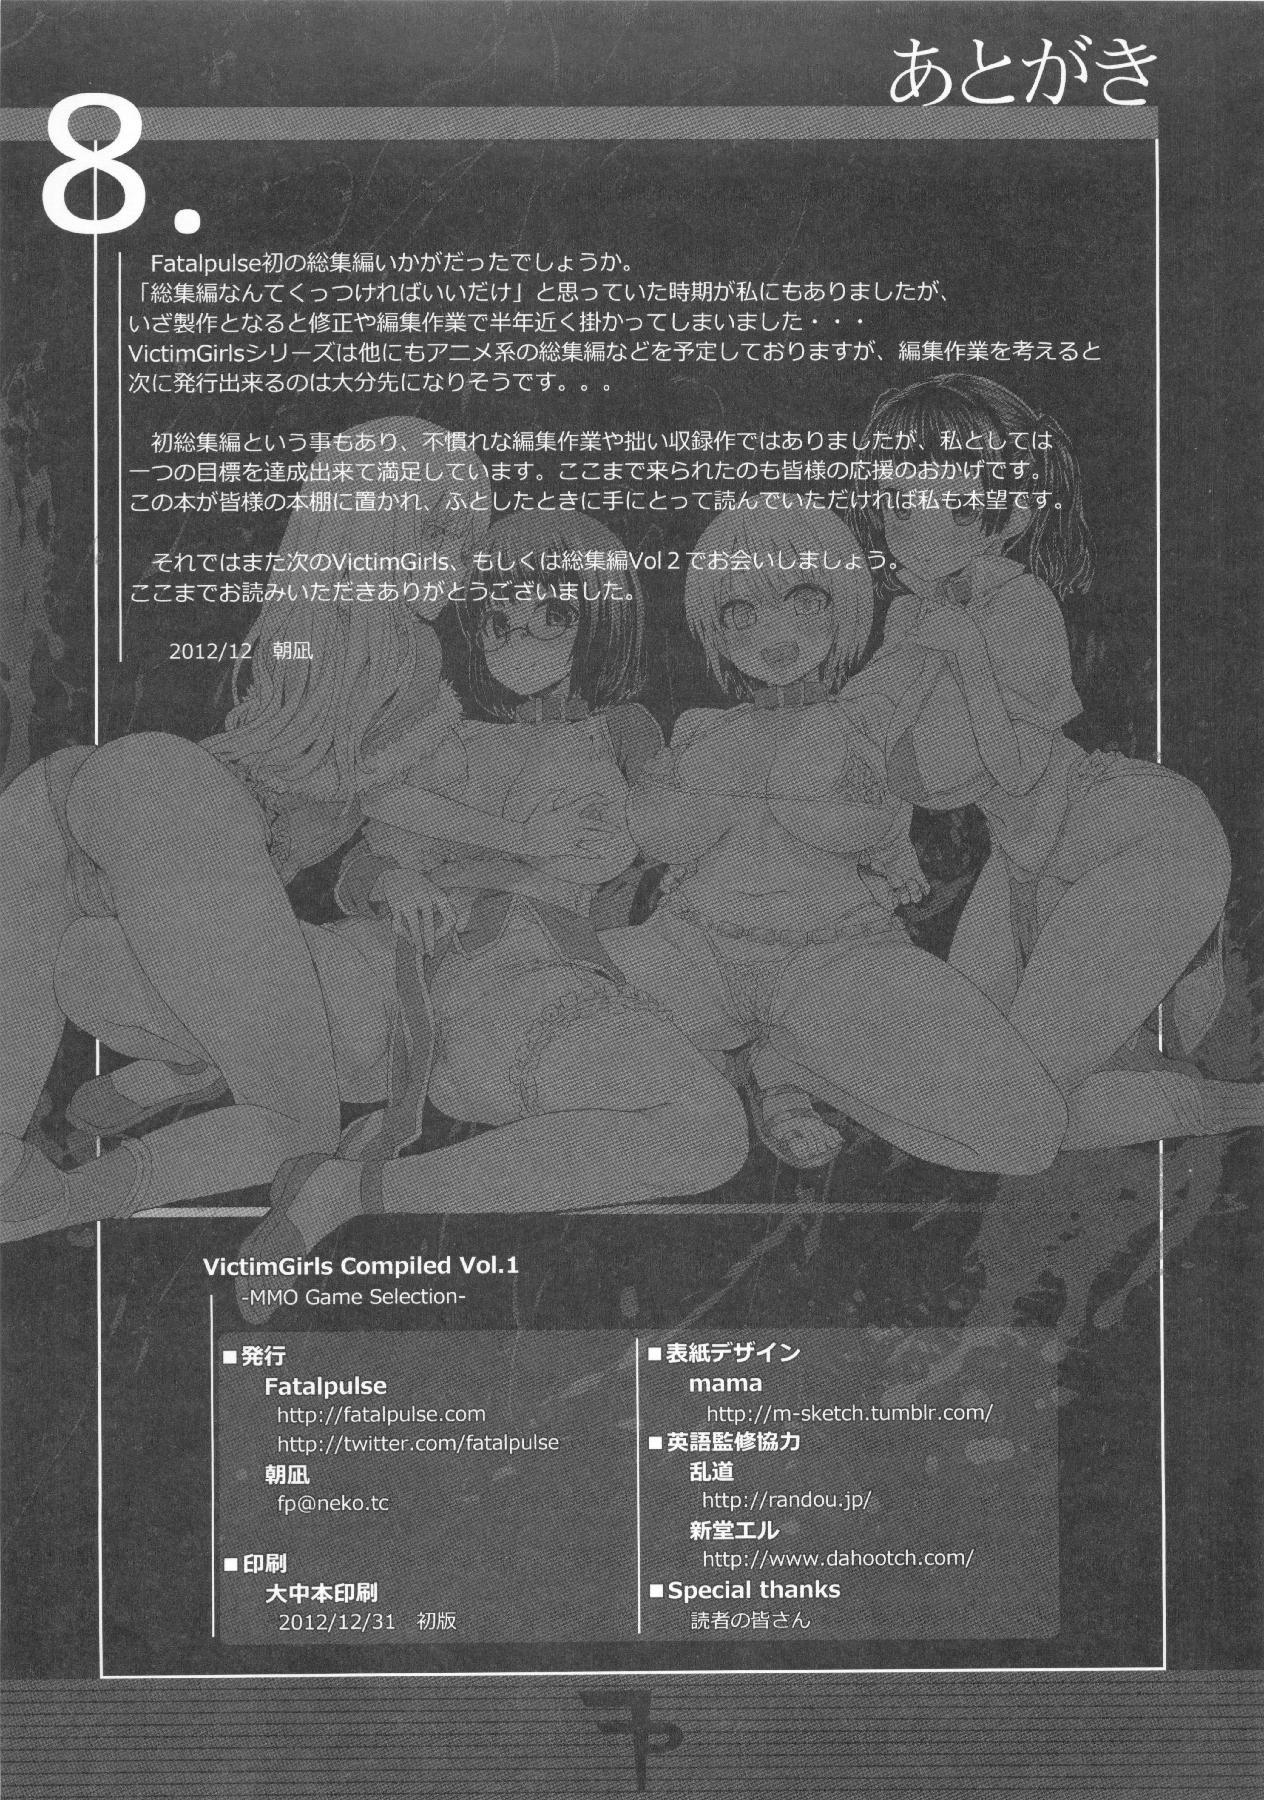 (C83) [Fatalpulse (Asanagi)] VictimGirls Compiled Vol.1 -Victimgirls Soushuuhen 1- MMO Game Selection (Various) 191